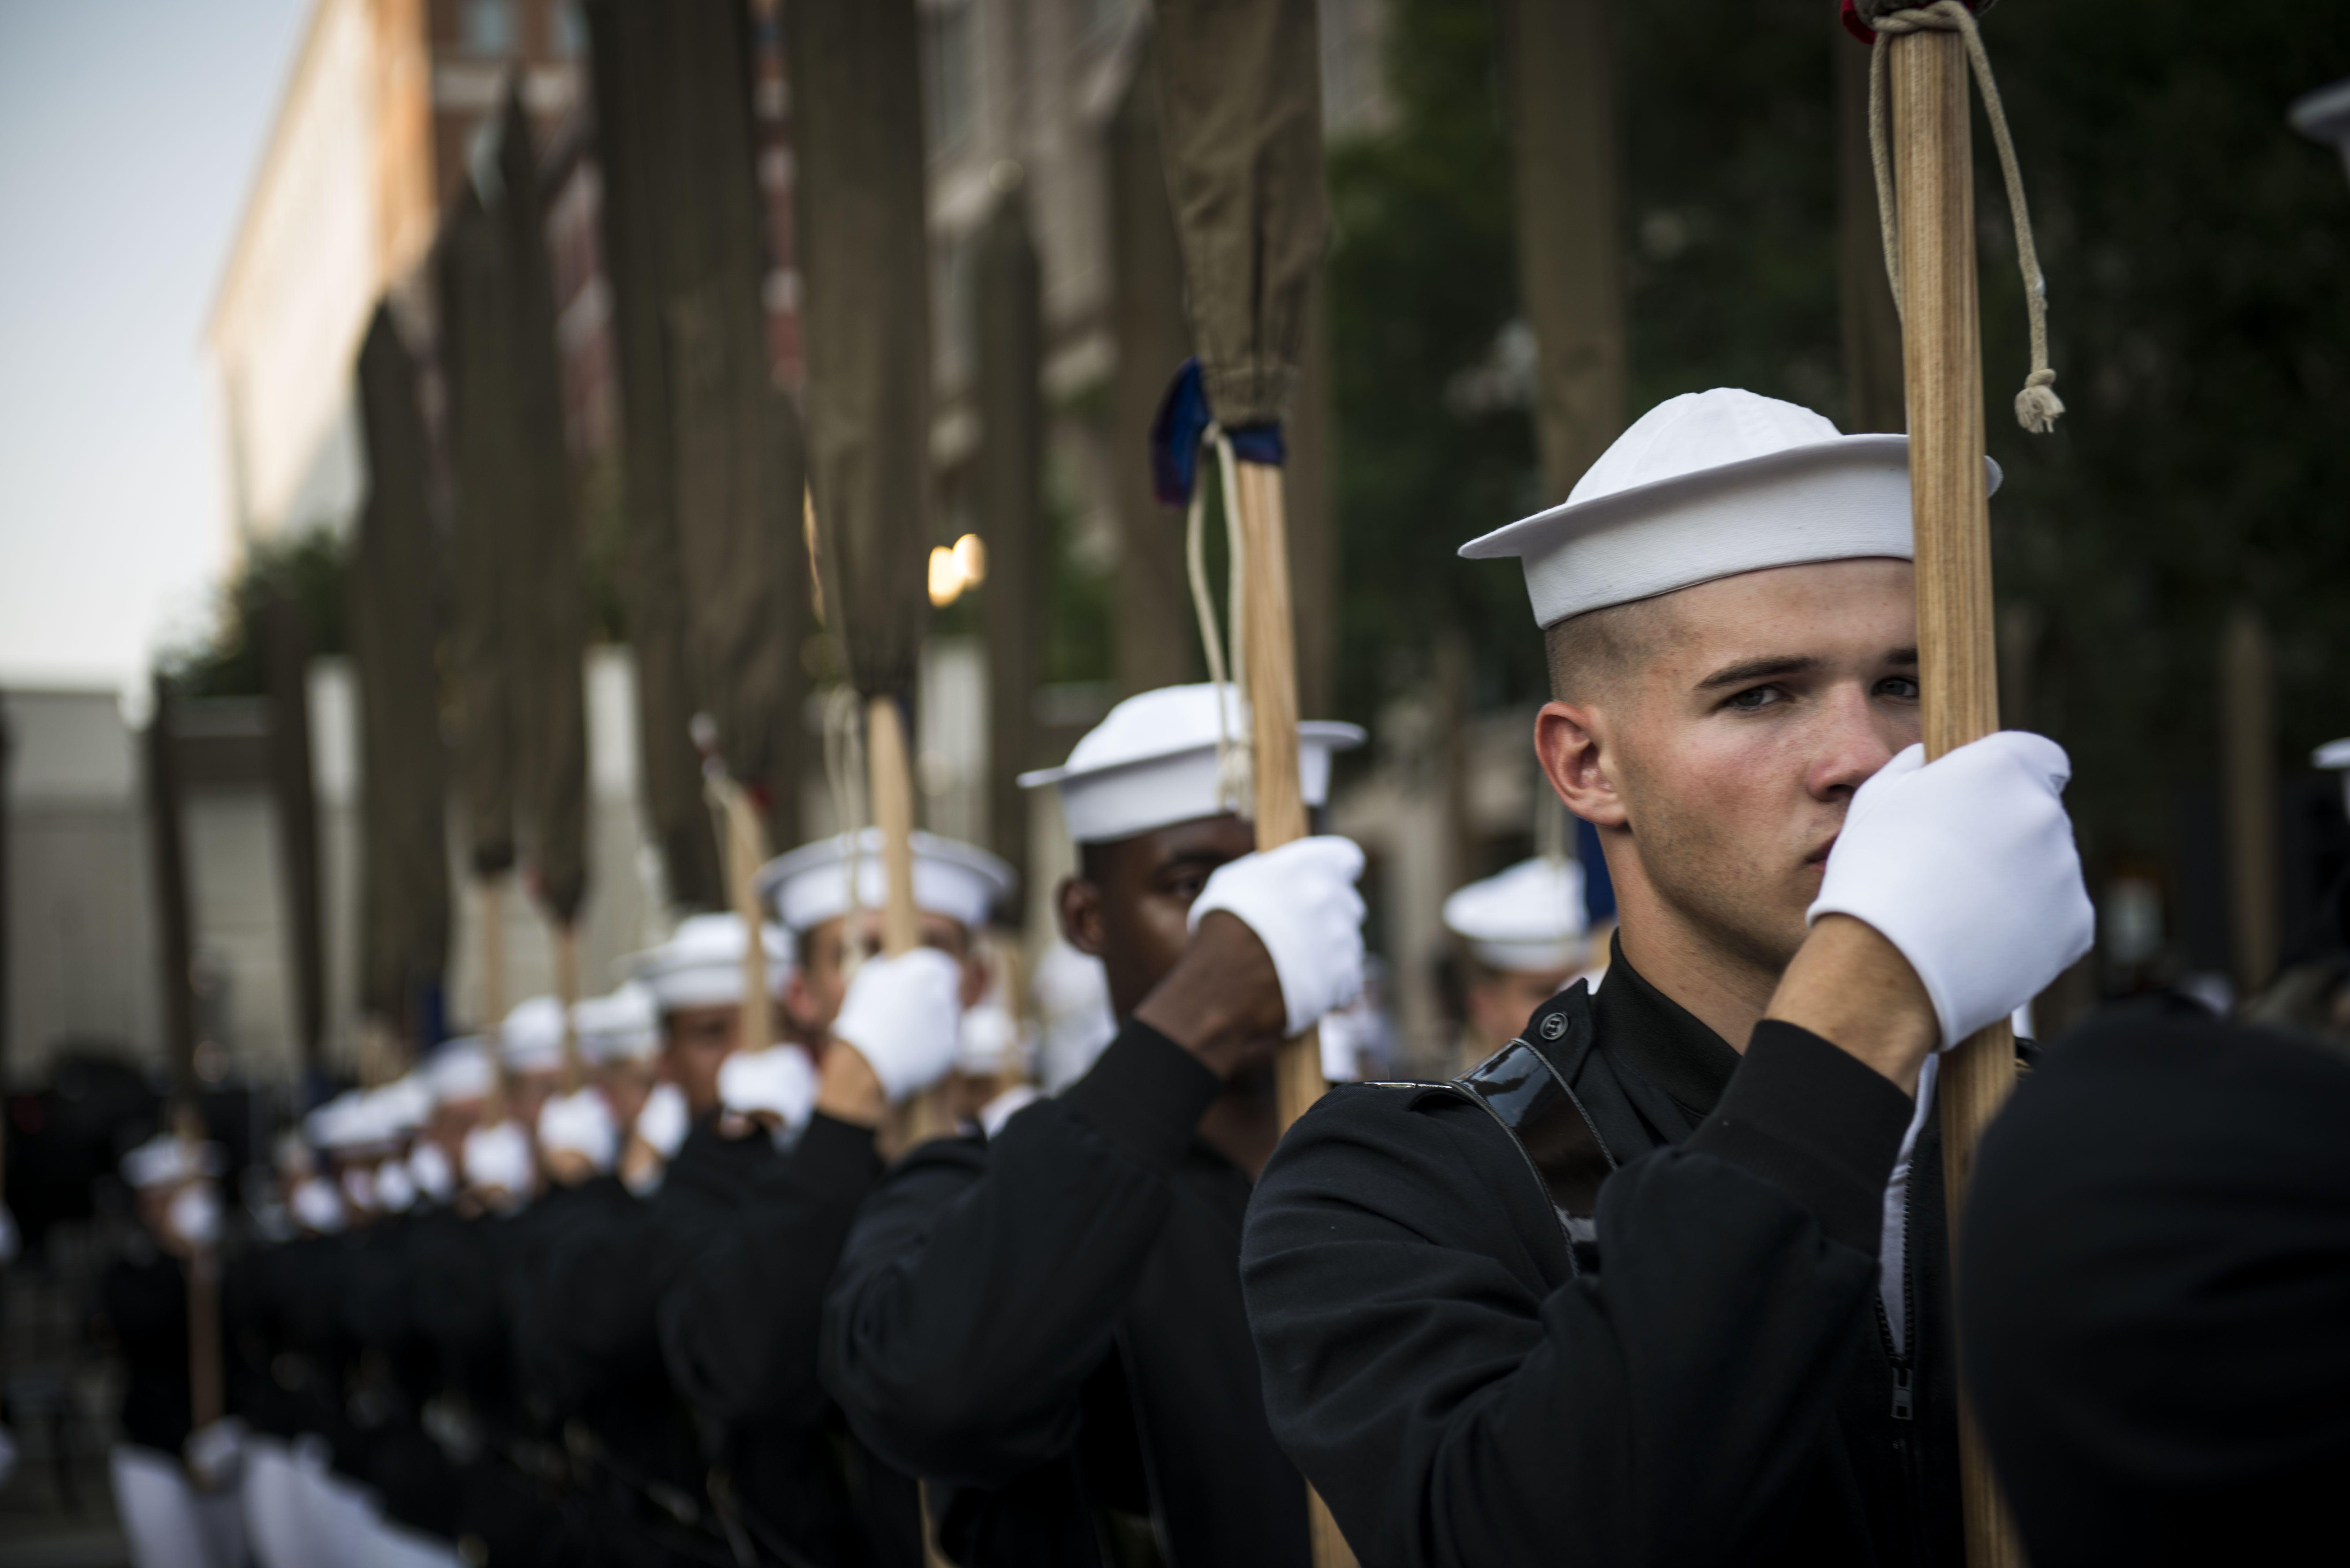 Us Navy Ceremonial Guard Hot Men In Uniform Pinterest - Us-navy-ceremonial-guard